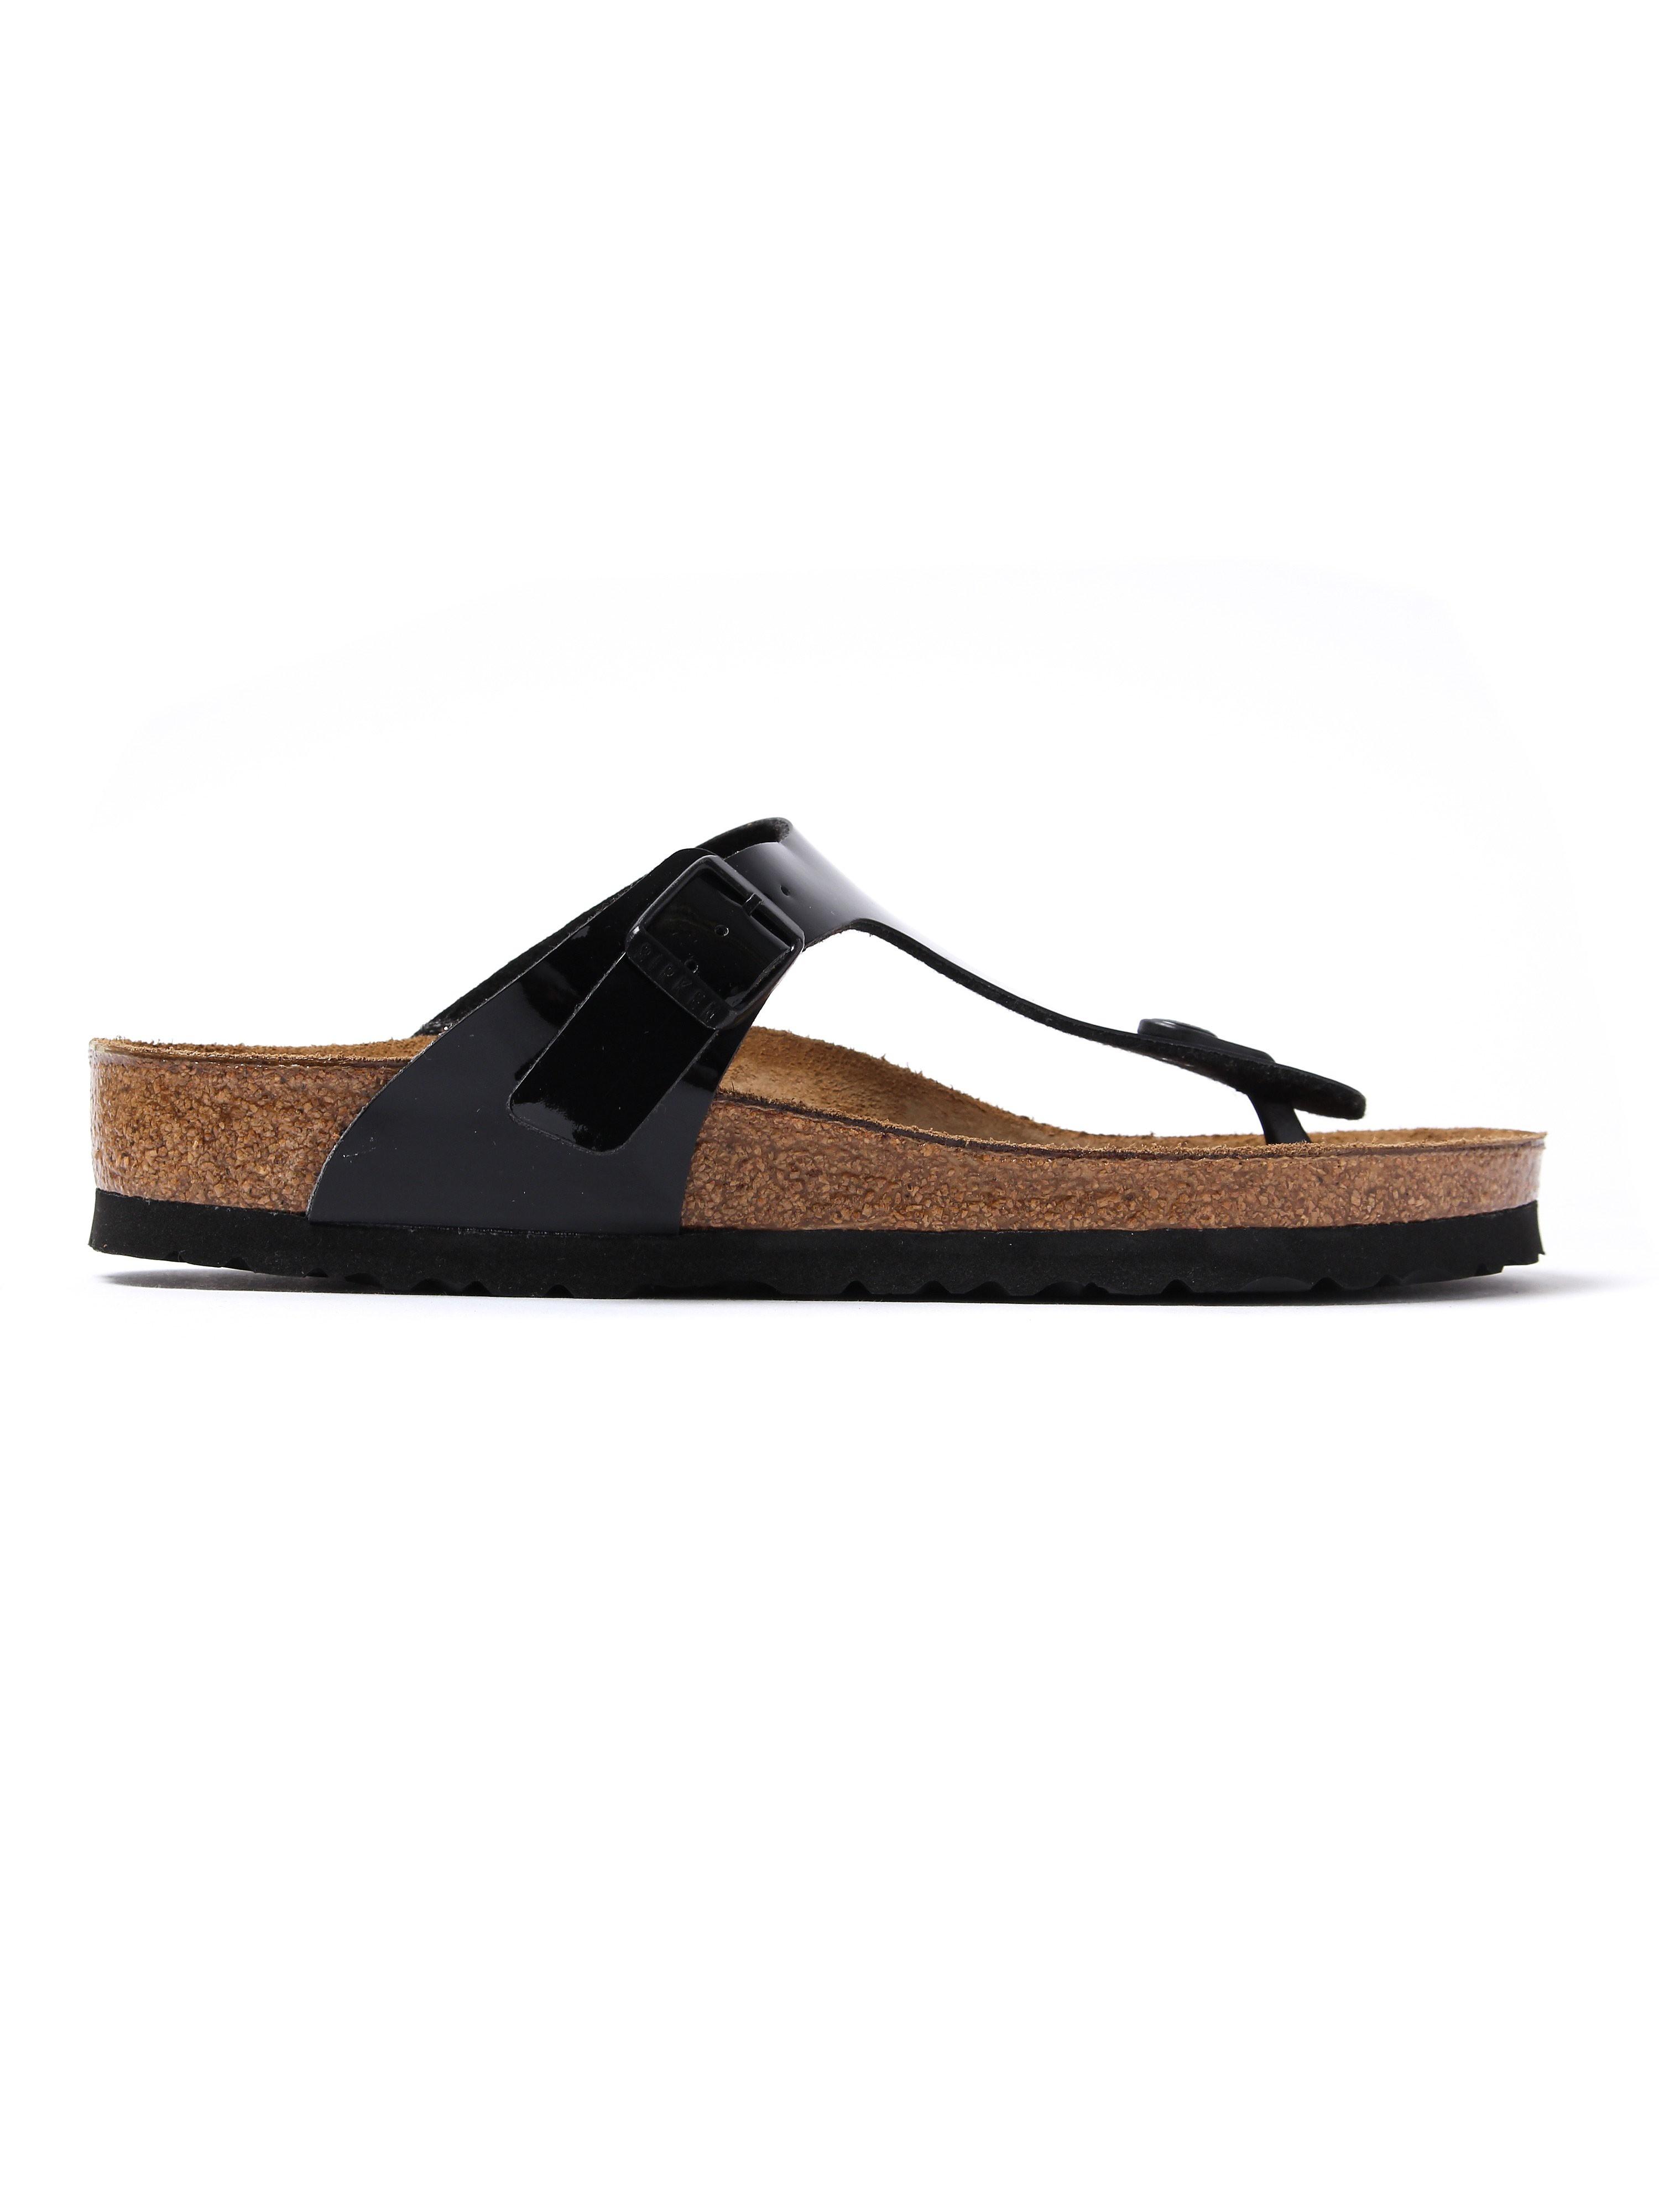 Birkenstock Women's Gizeh Toe Strap Sandals - Black Patent